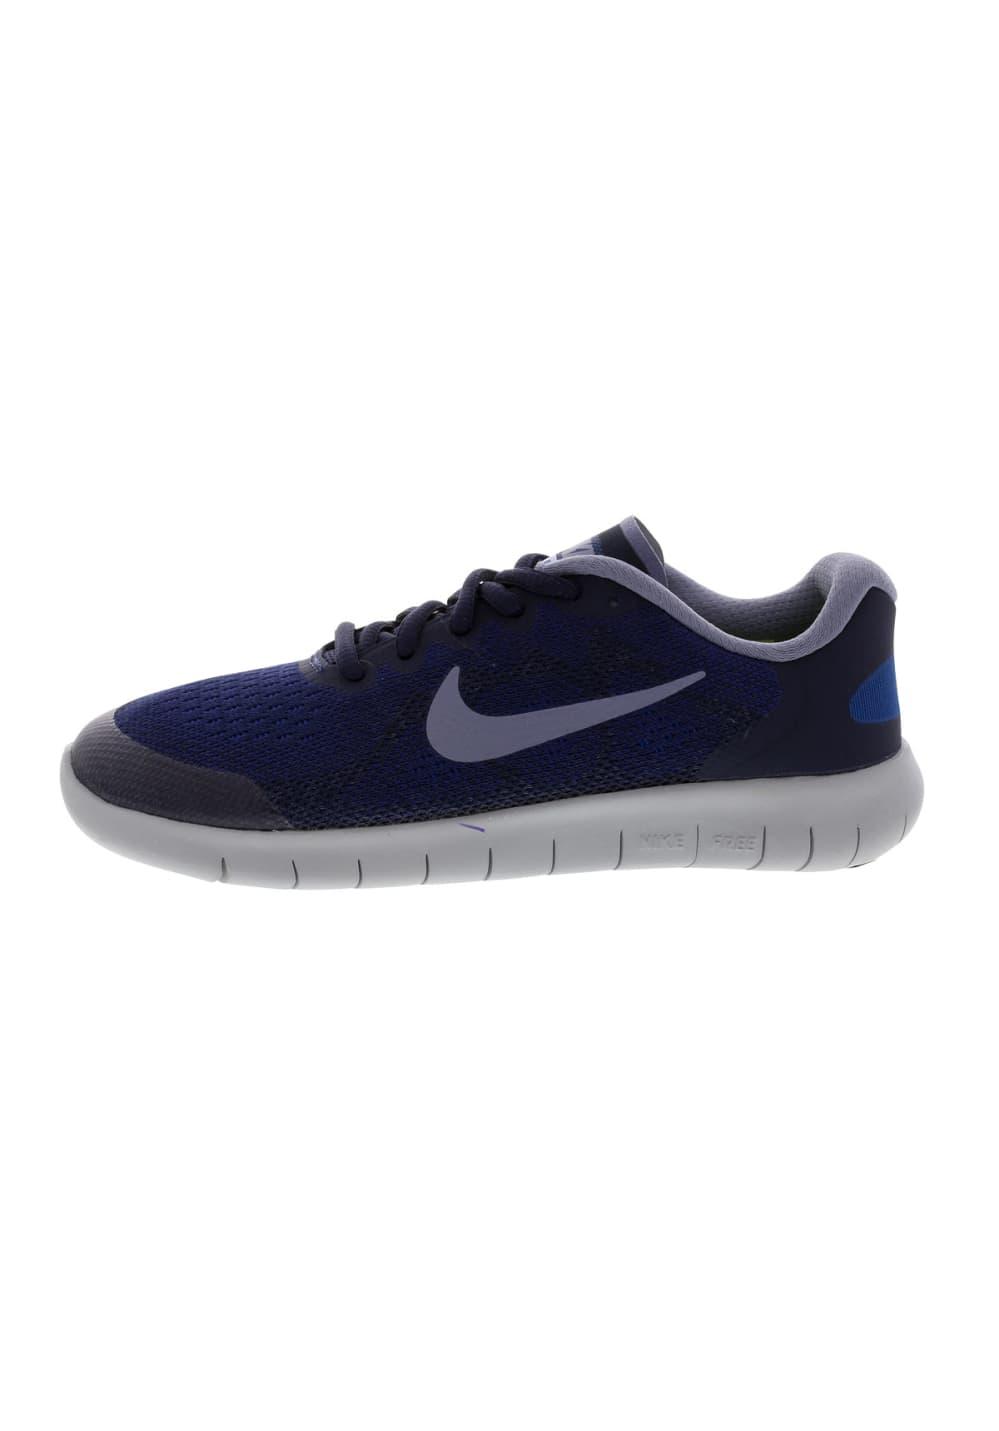 2017 Nike Rn Running Free Bleu Gs Chaussures Boys CQBhdxrts